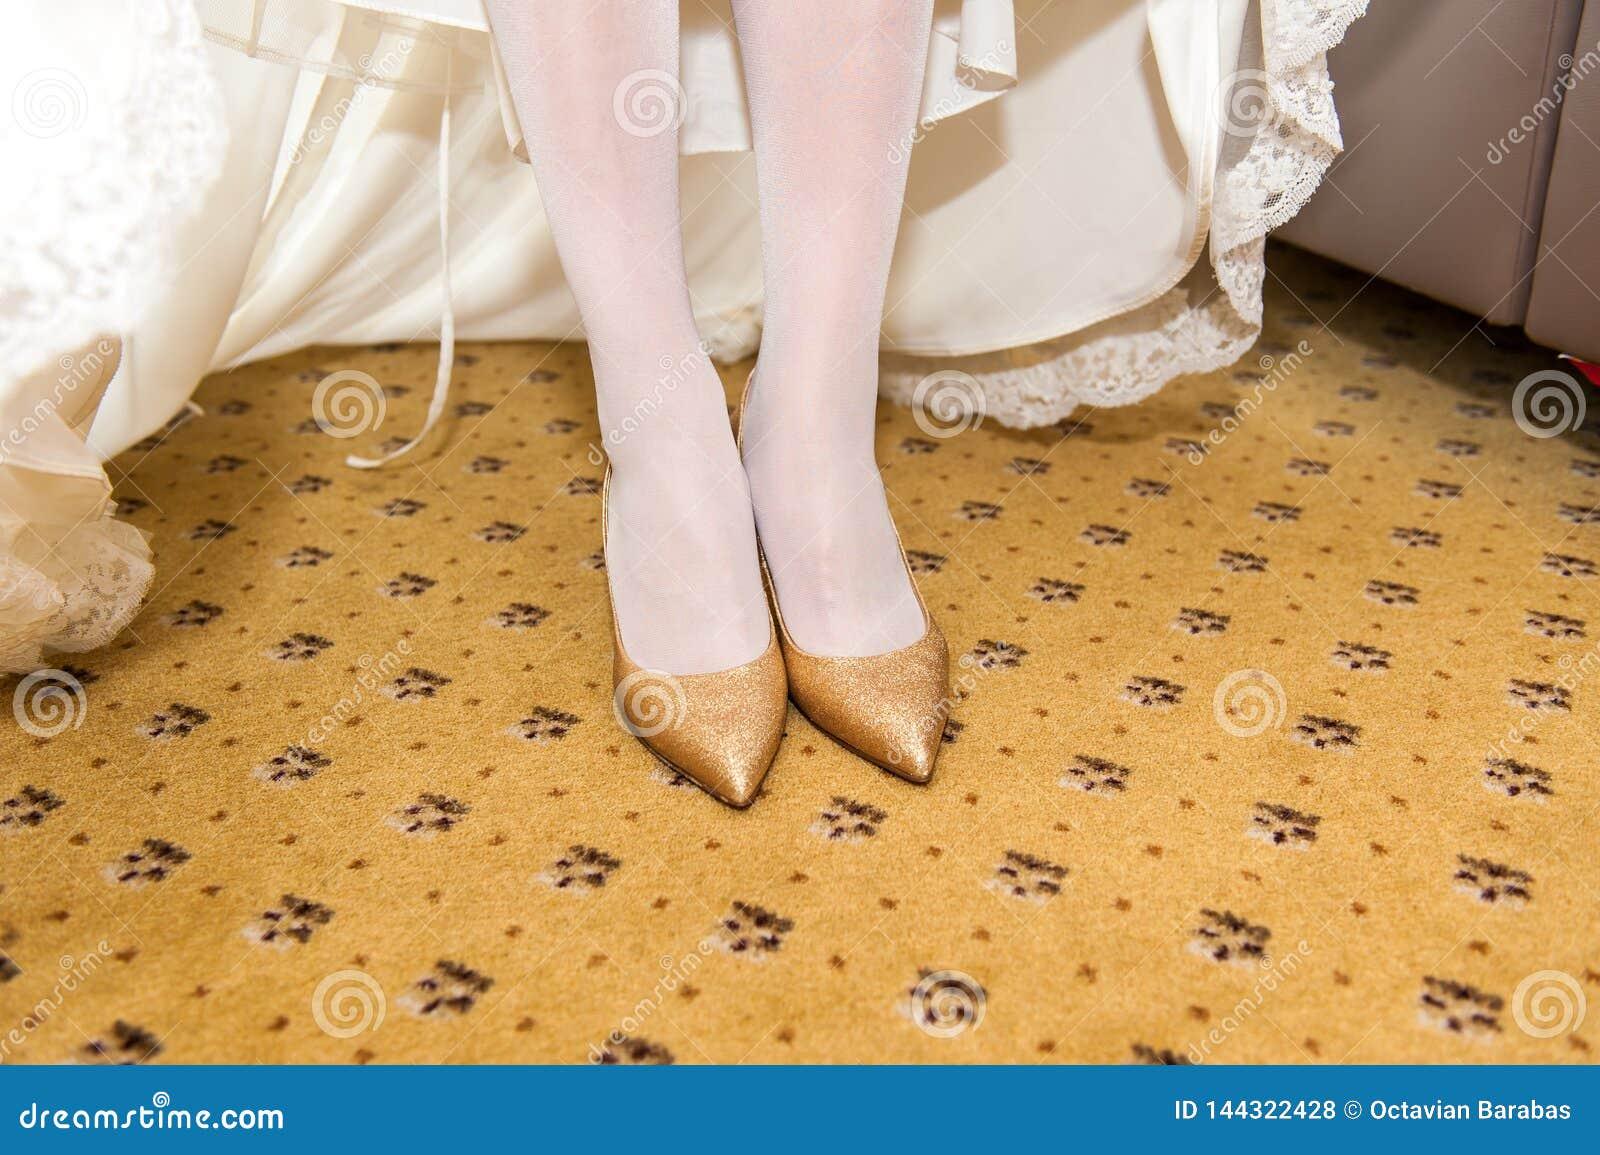 Golden wedding shoes on brides feet